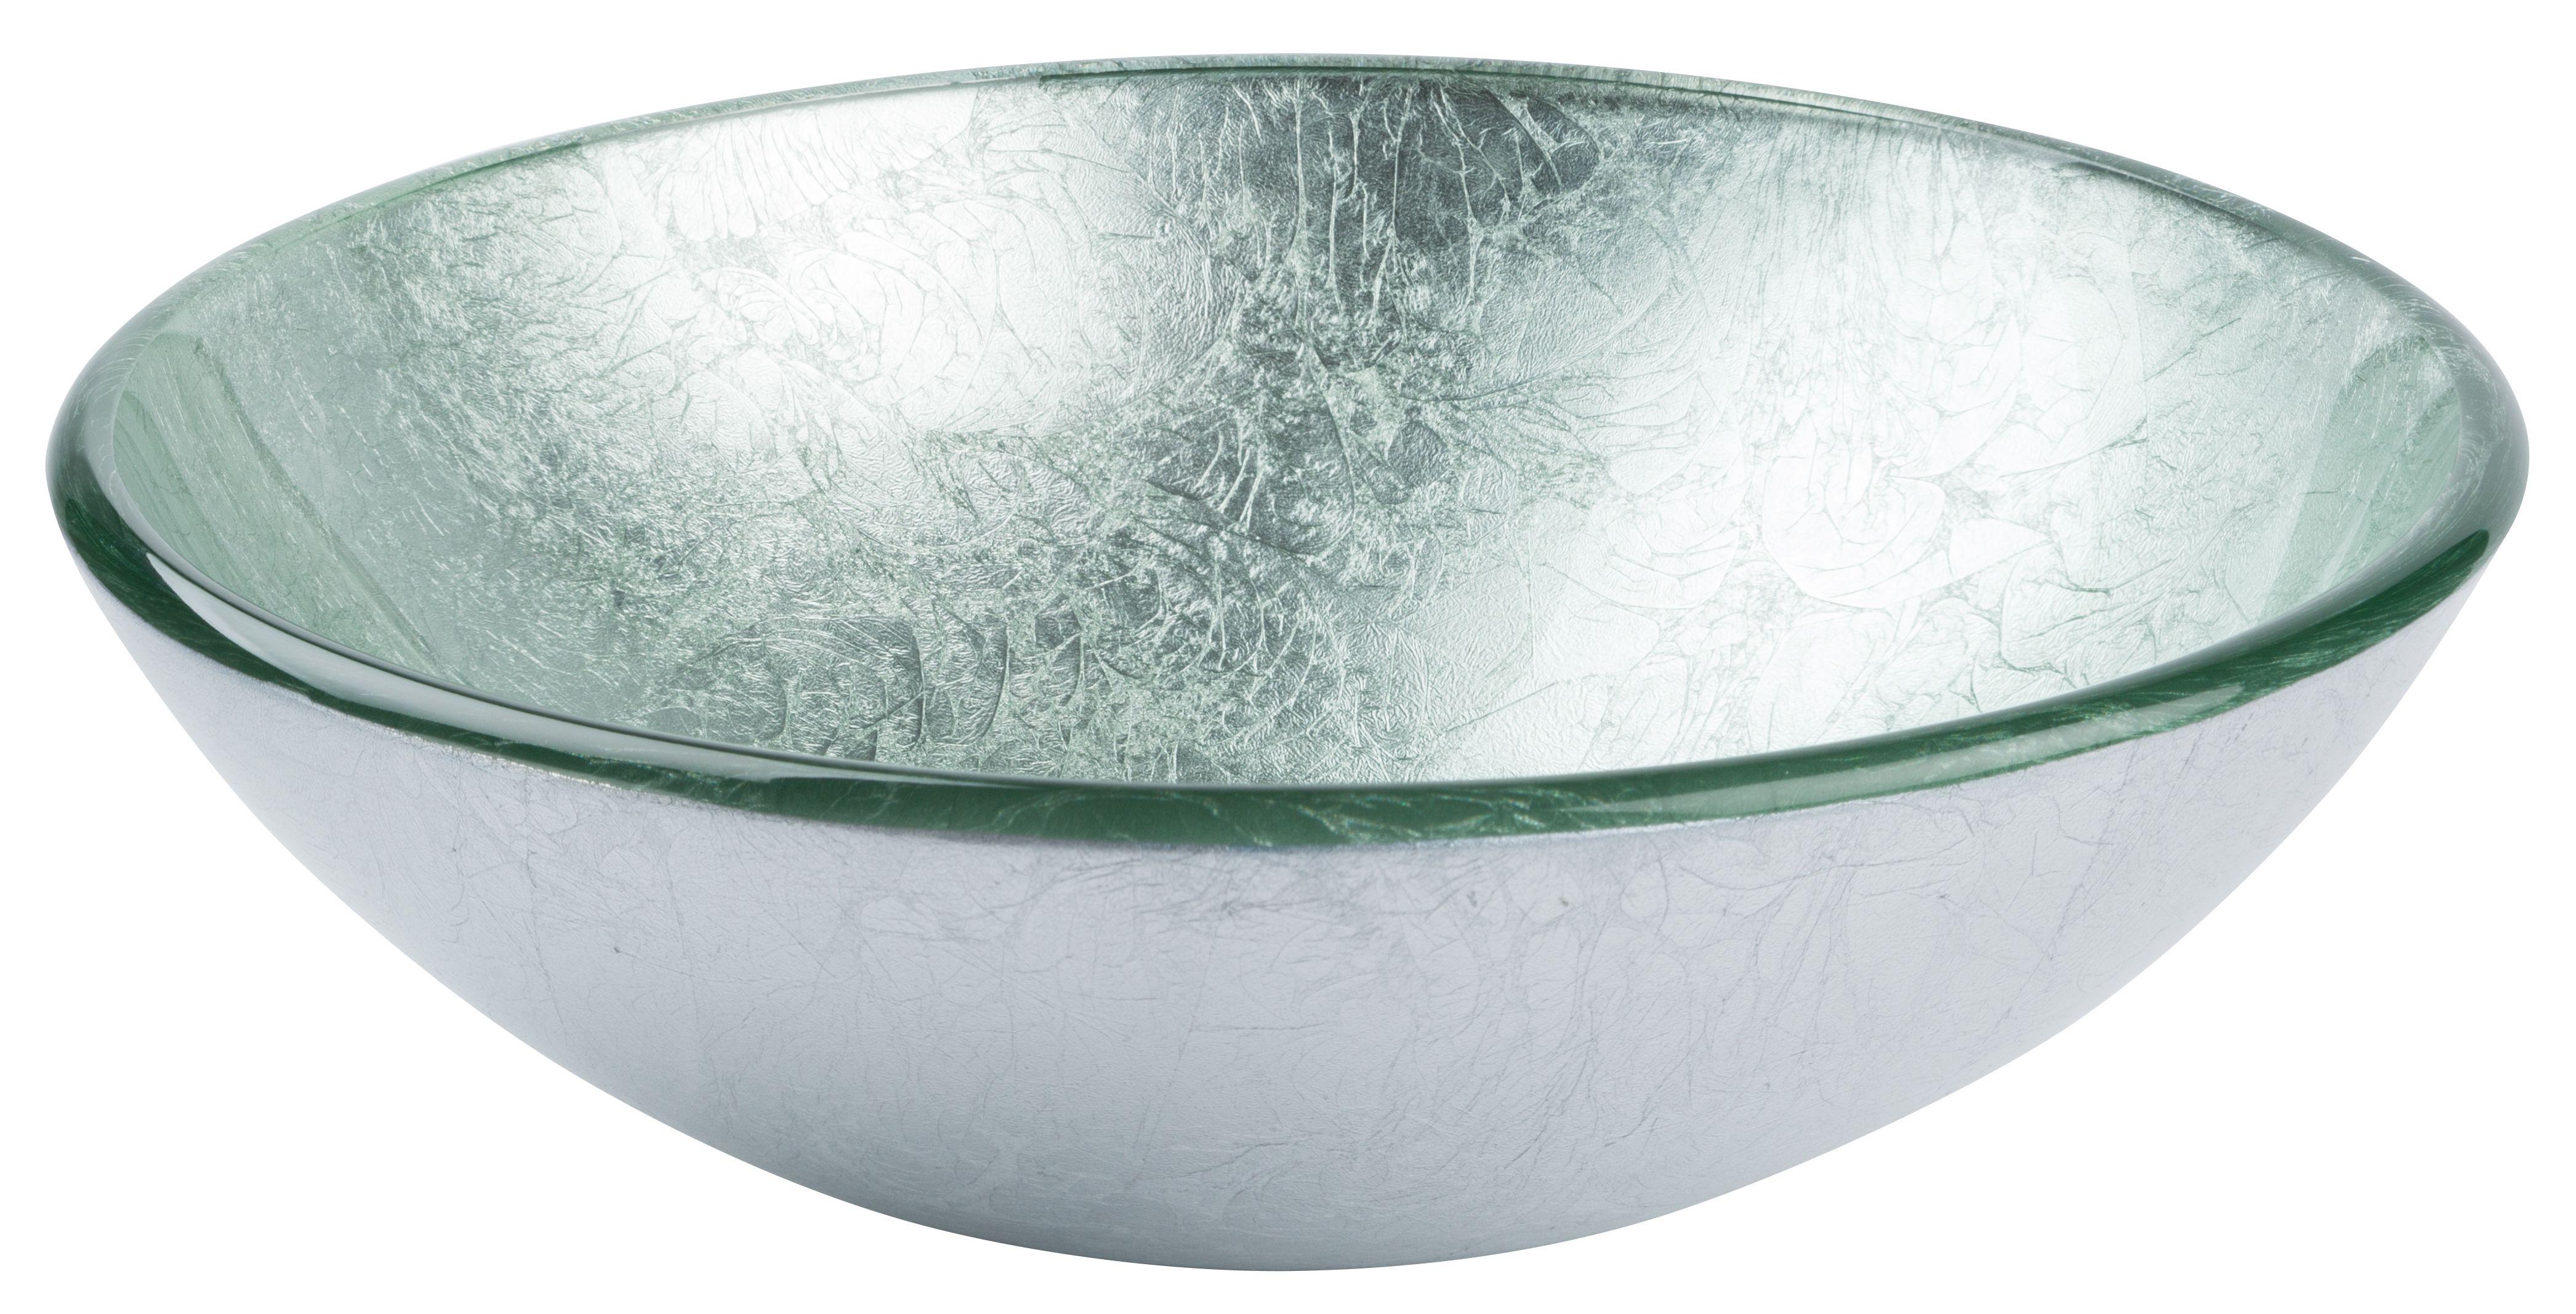 Silver Glass Vessel Basin From Www.uniquesinks.com.au